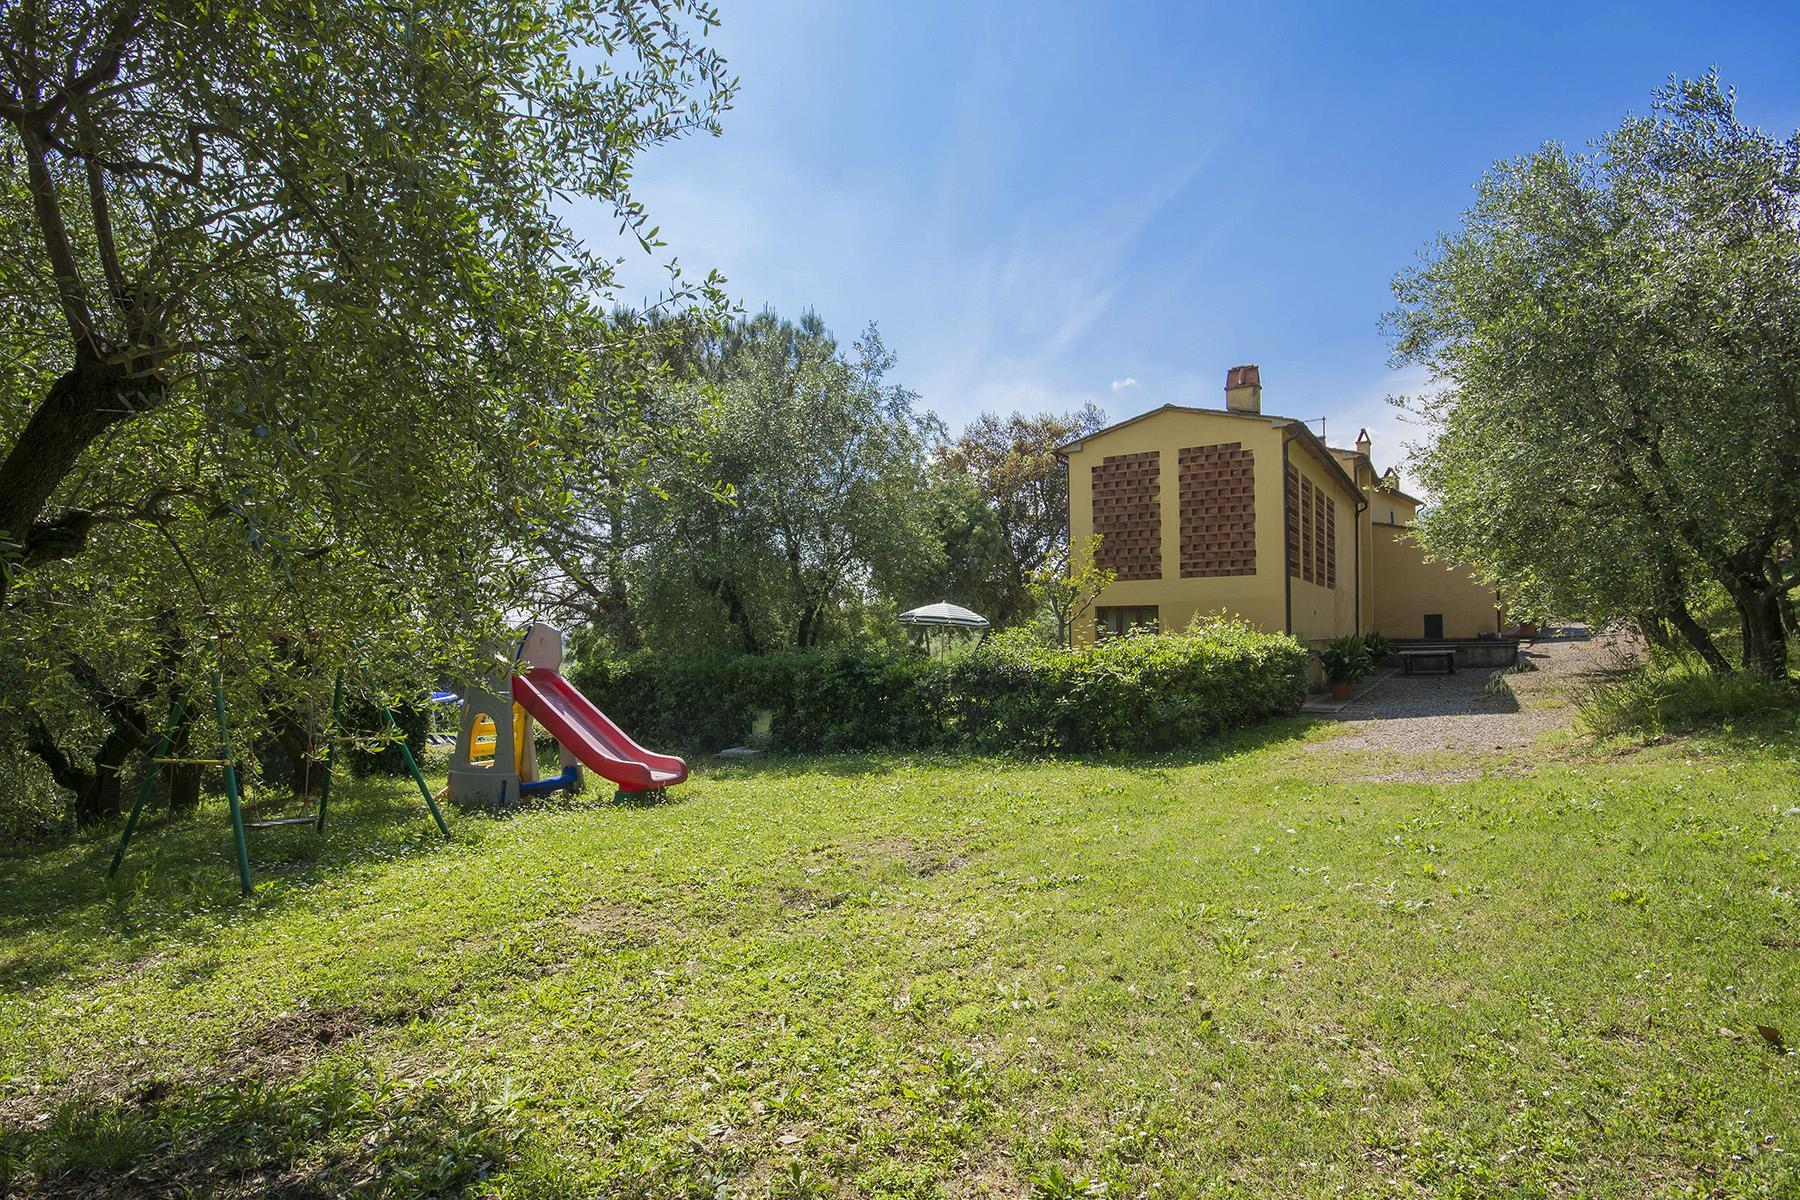 Pescia小山丘上美丽的乡间农舍 - 47